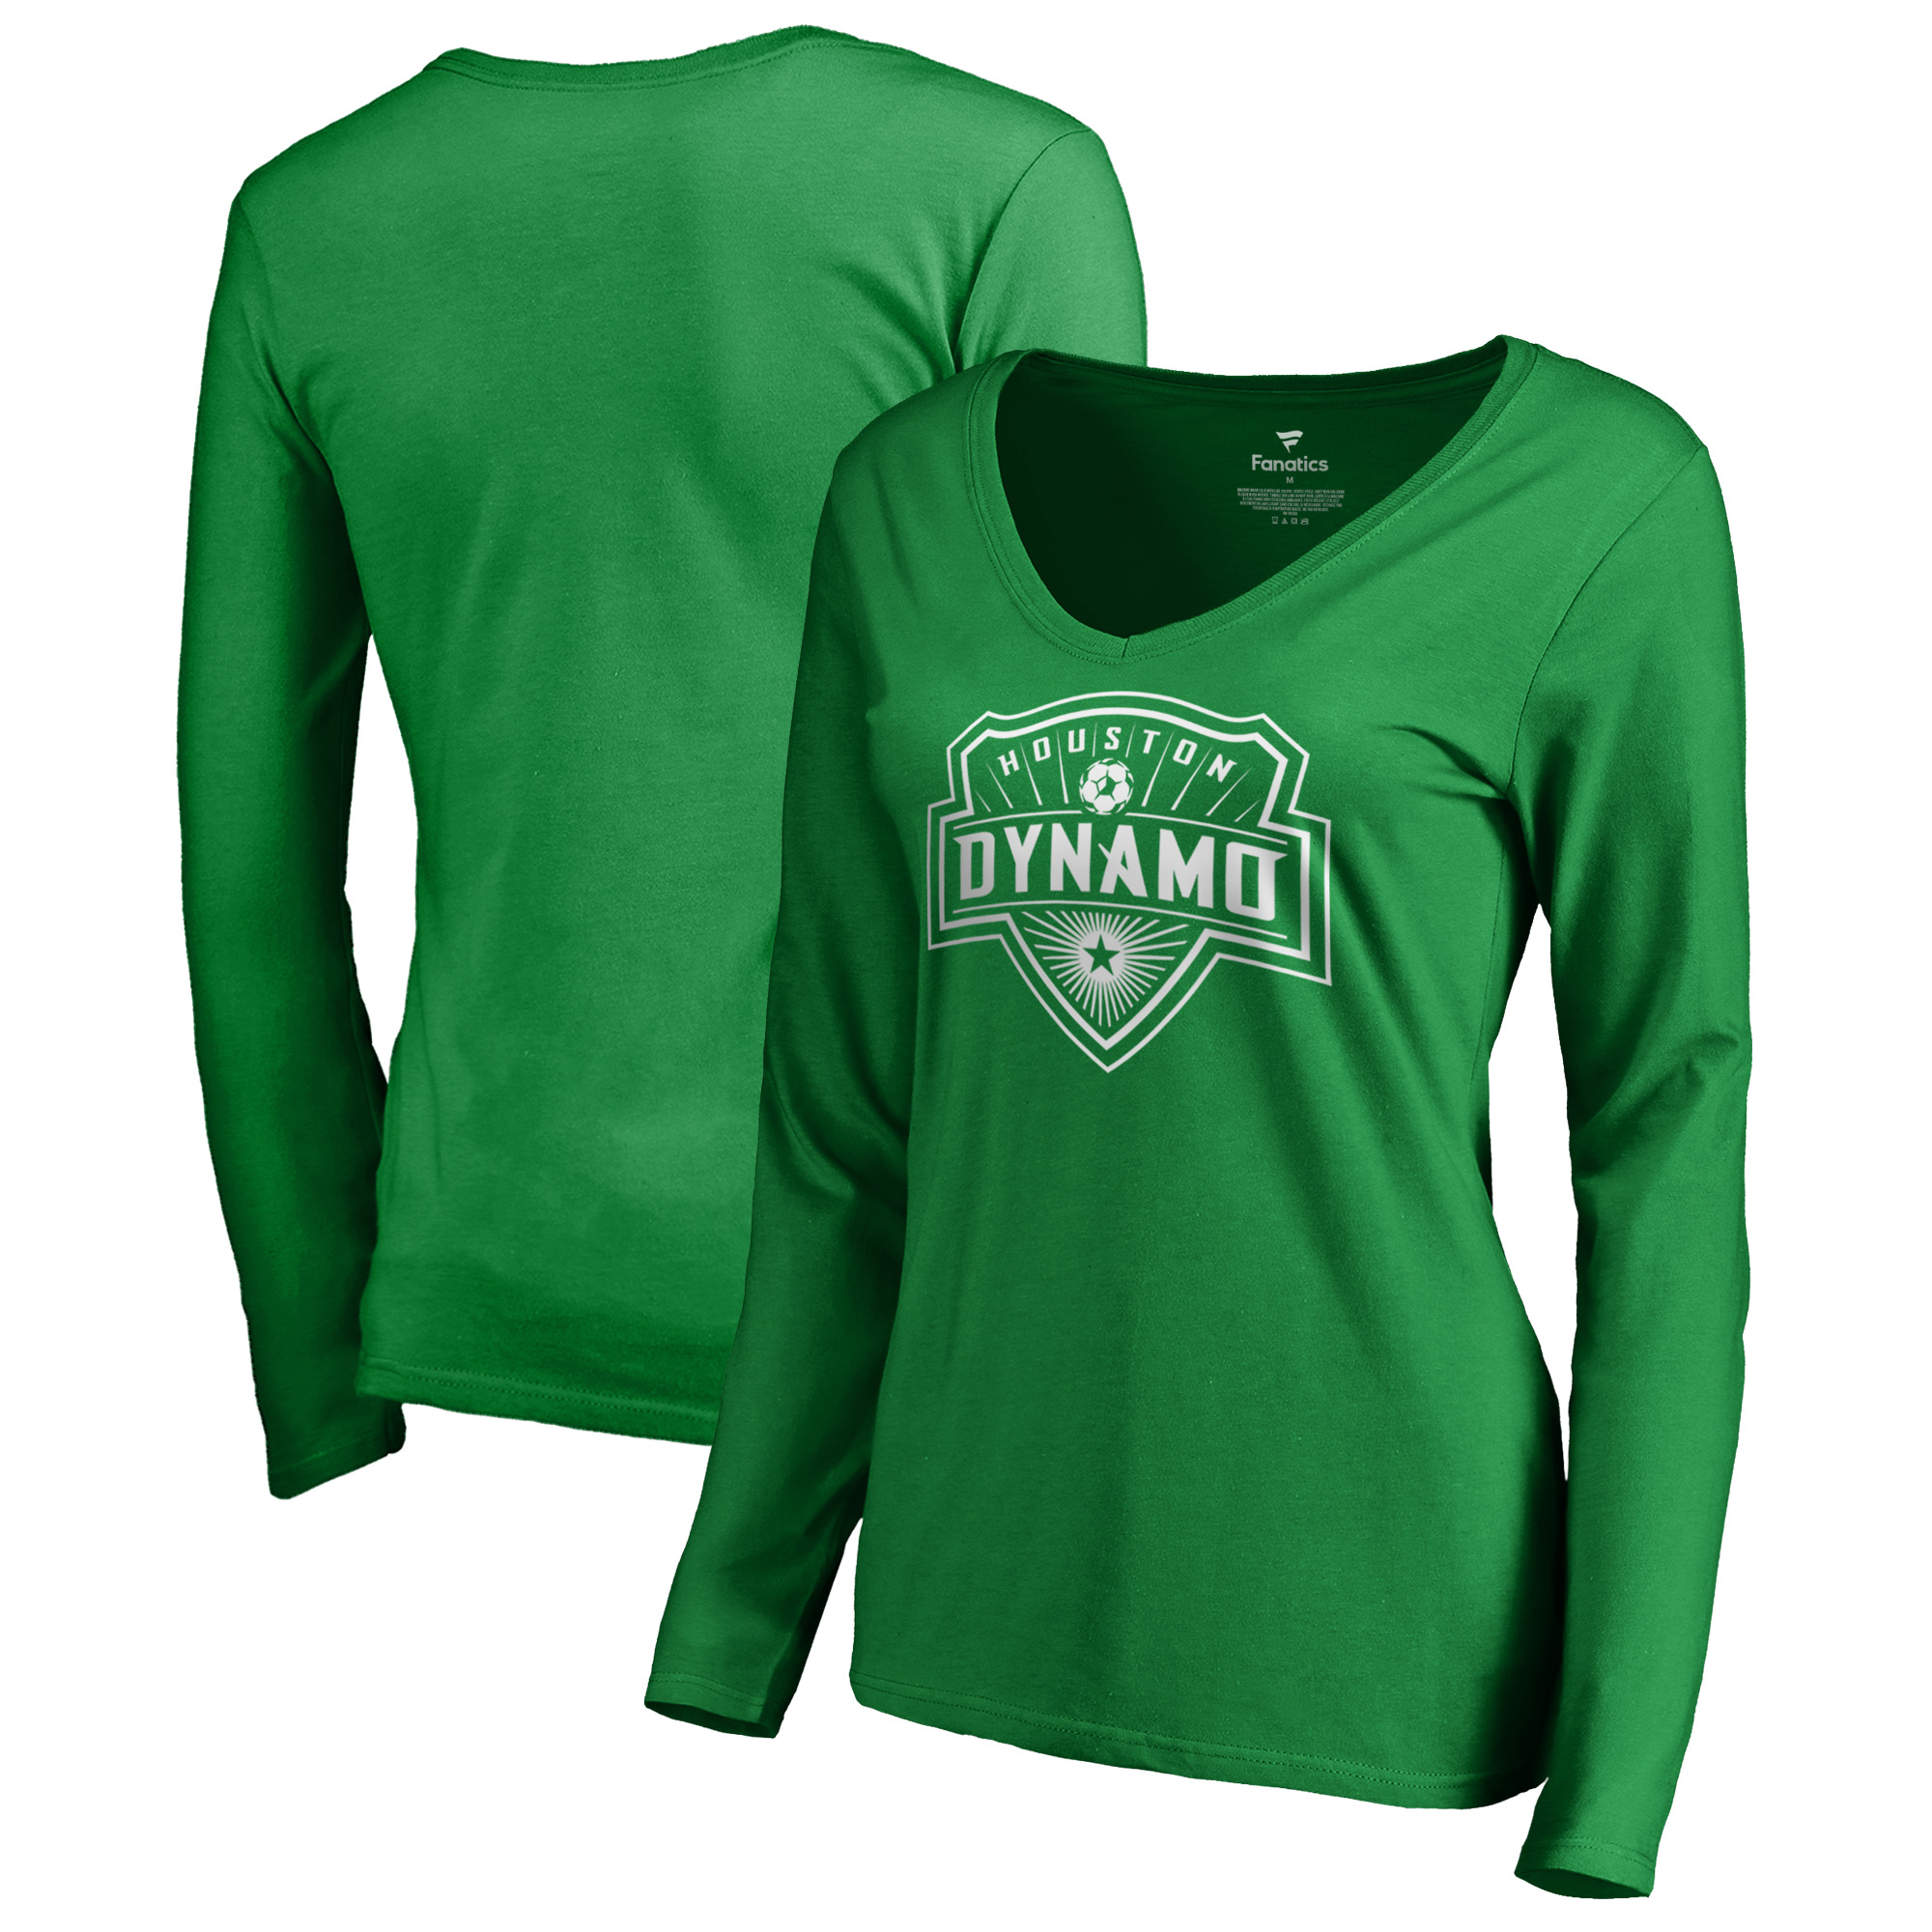 Houston Dynamo Fanatics Branded Women's St. Patrick's Day White Logo Long Sleeve V-Neck T-Shirt - Kelly Green